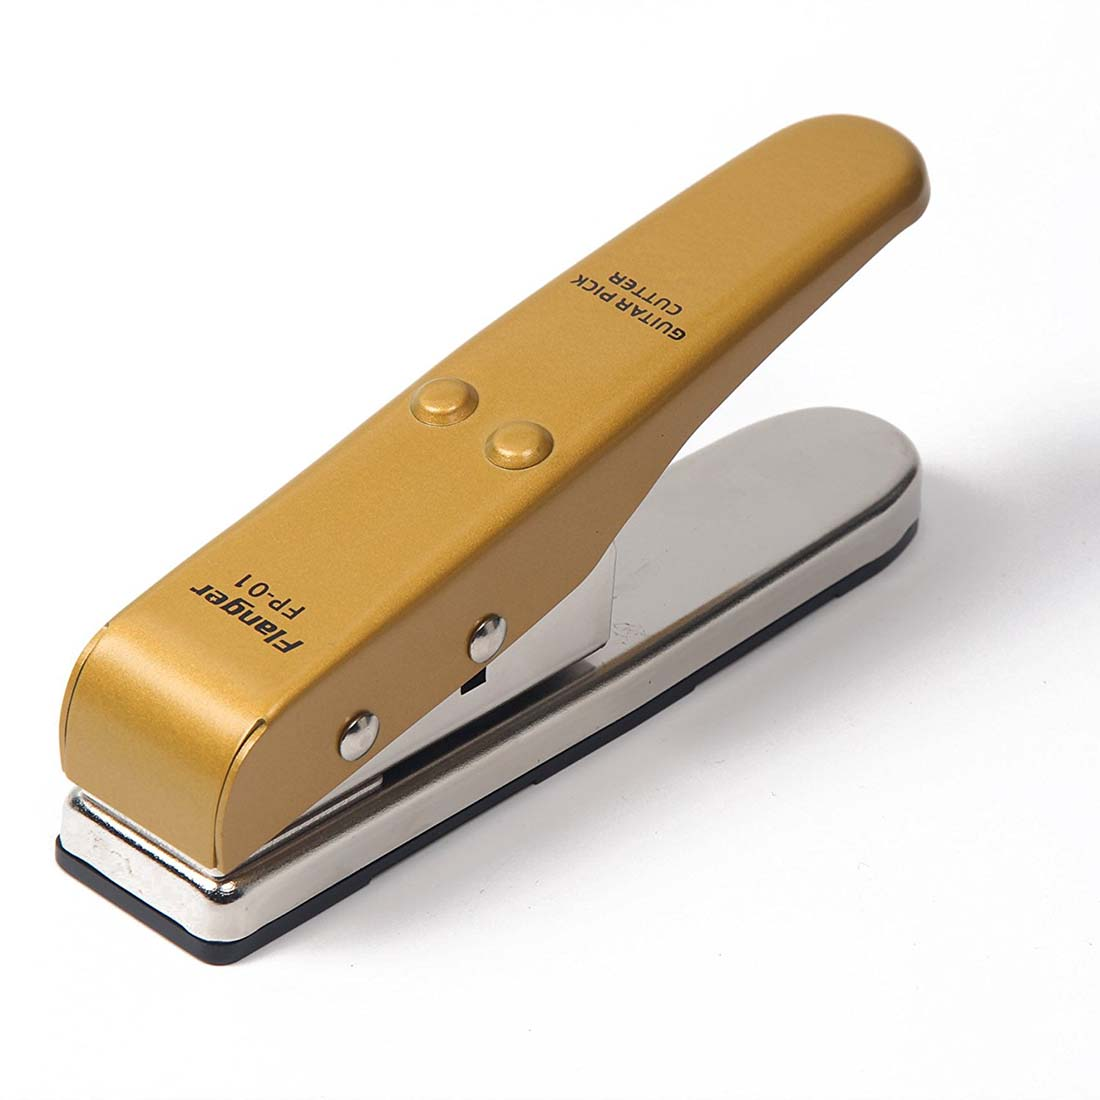 Signstek Porfessional Portable Flanger Pick Punch Guitar Pick Plectrum Maker Pick Cutter *Gold *